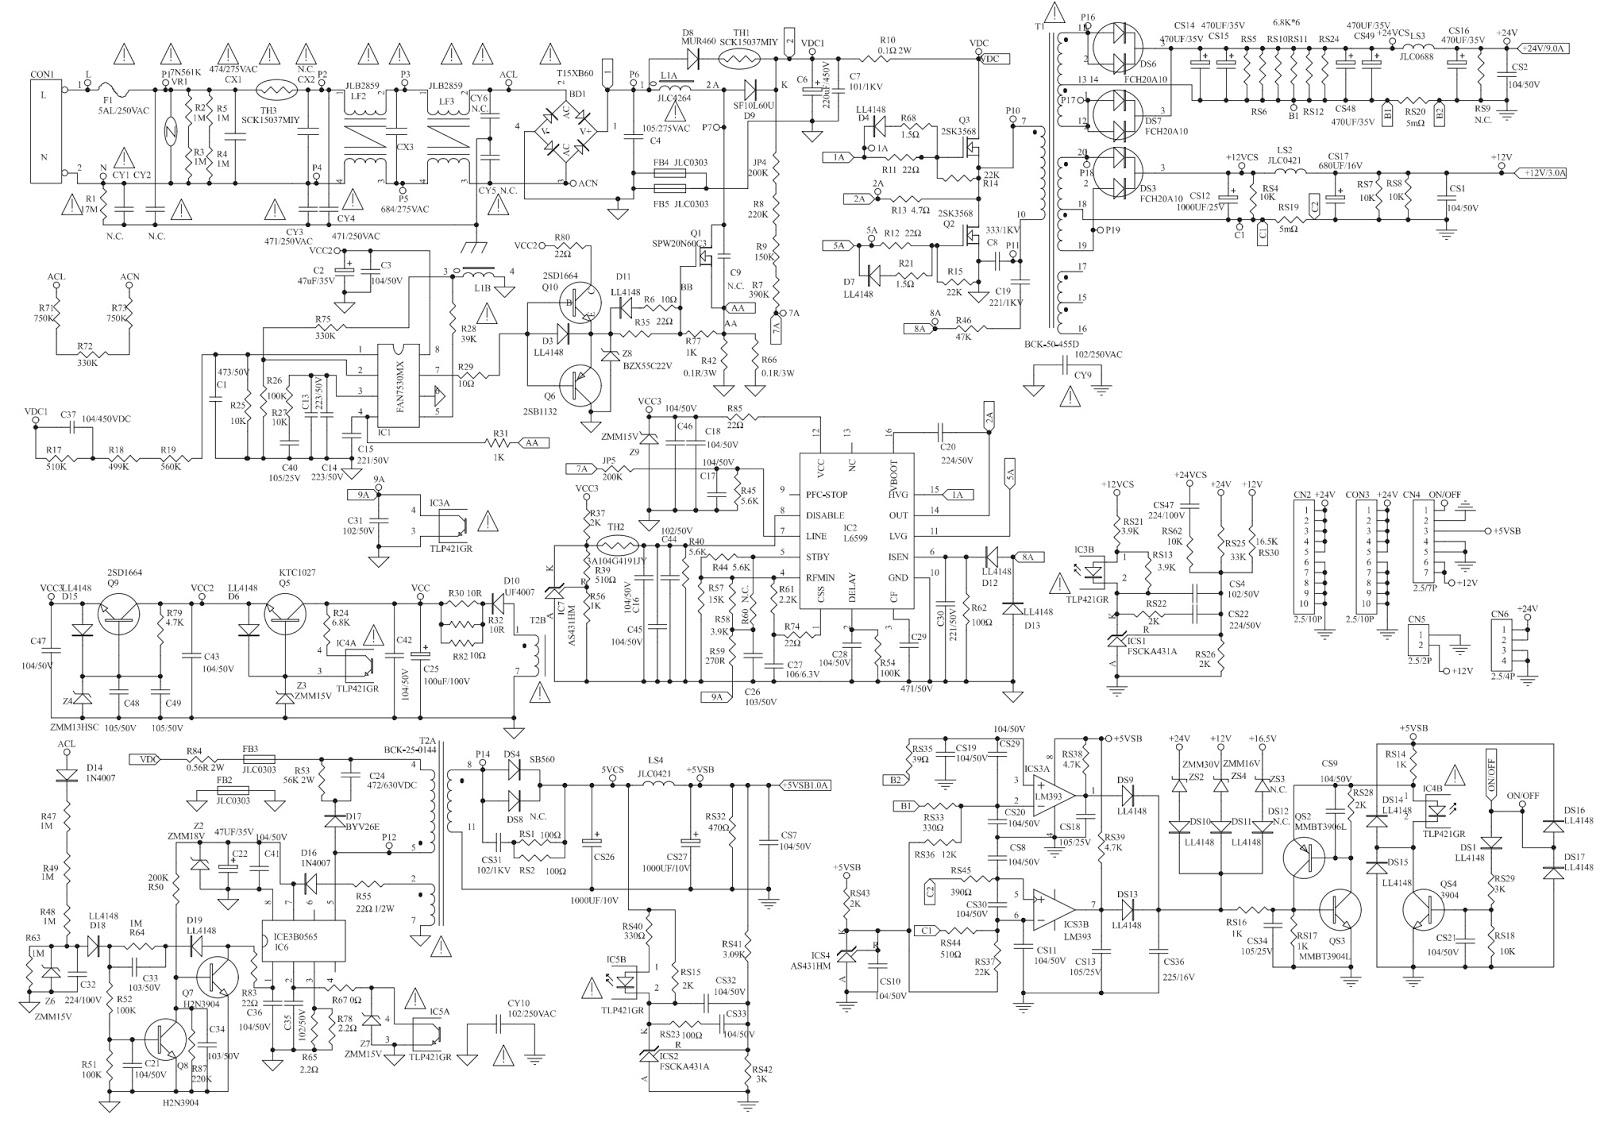 Bluebird Bus Wiring Diagram Schematic Diagrams Collins 1994 Trusted U2022 Propane School